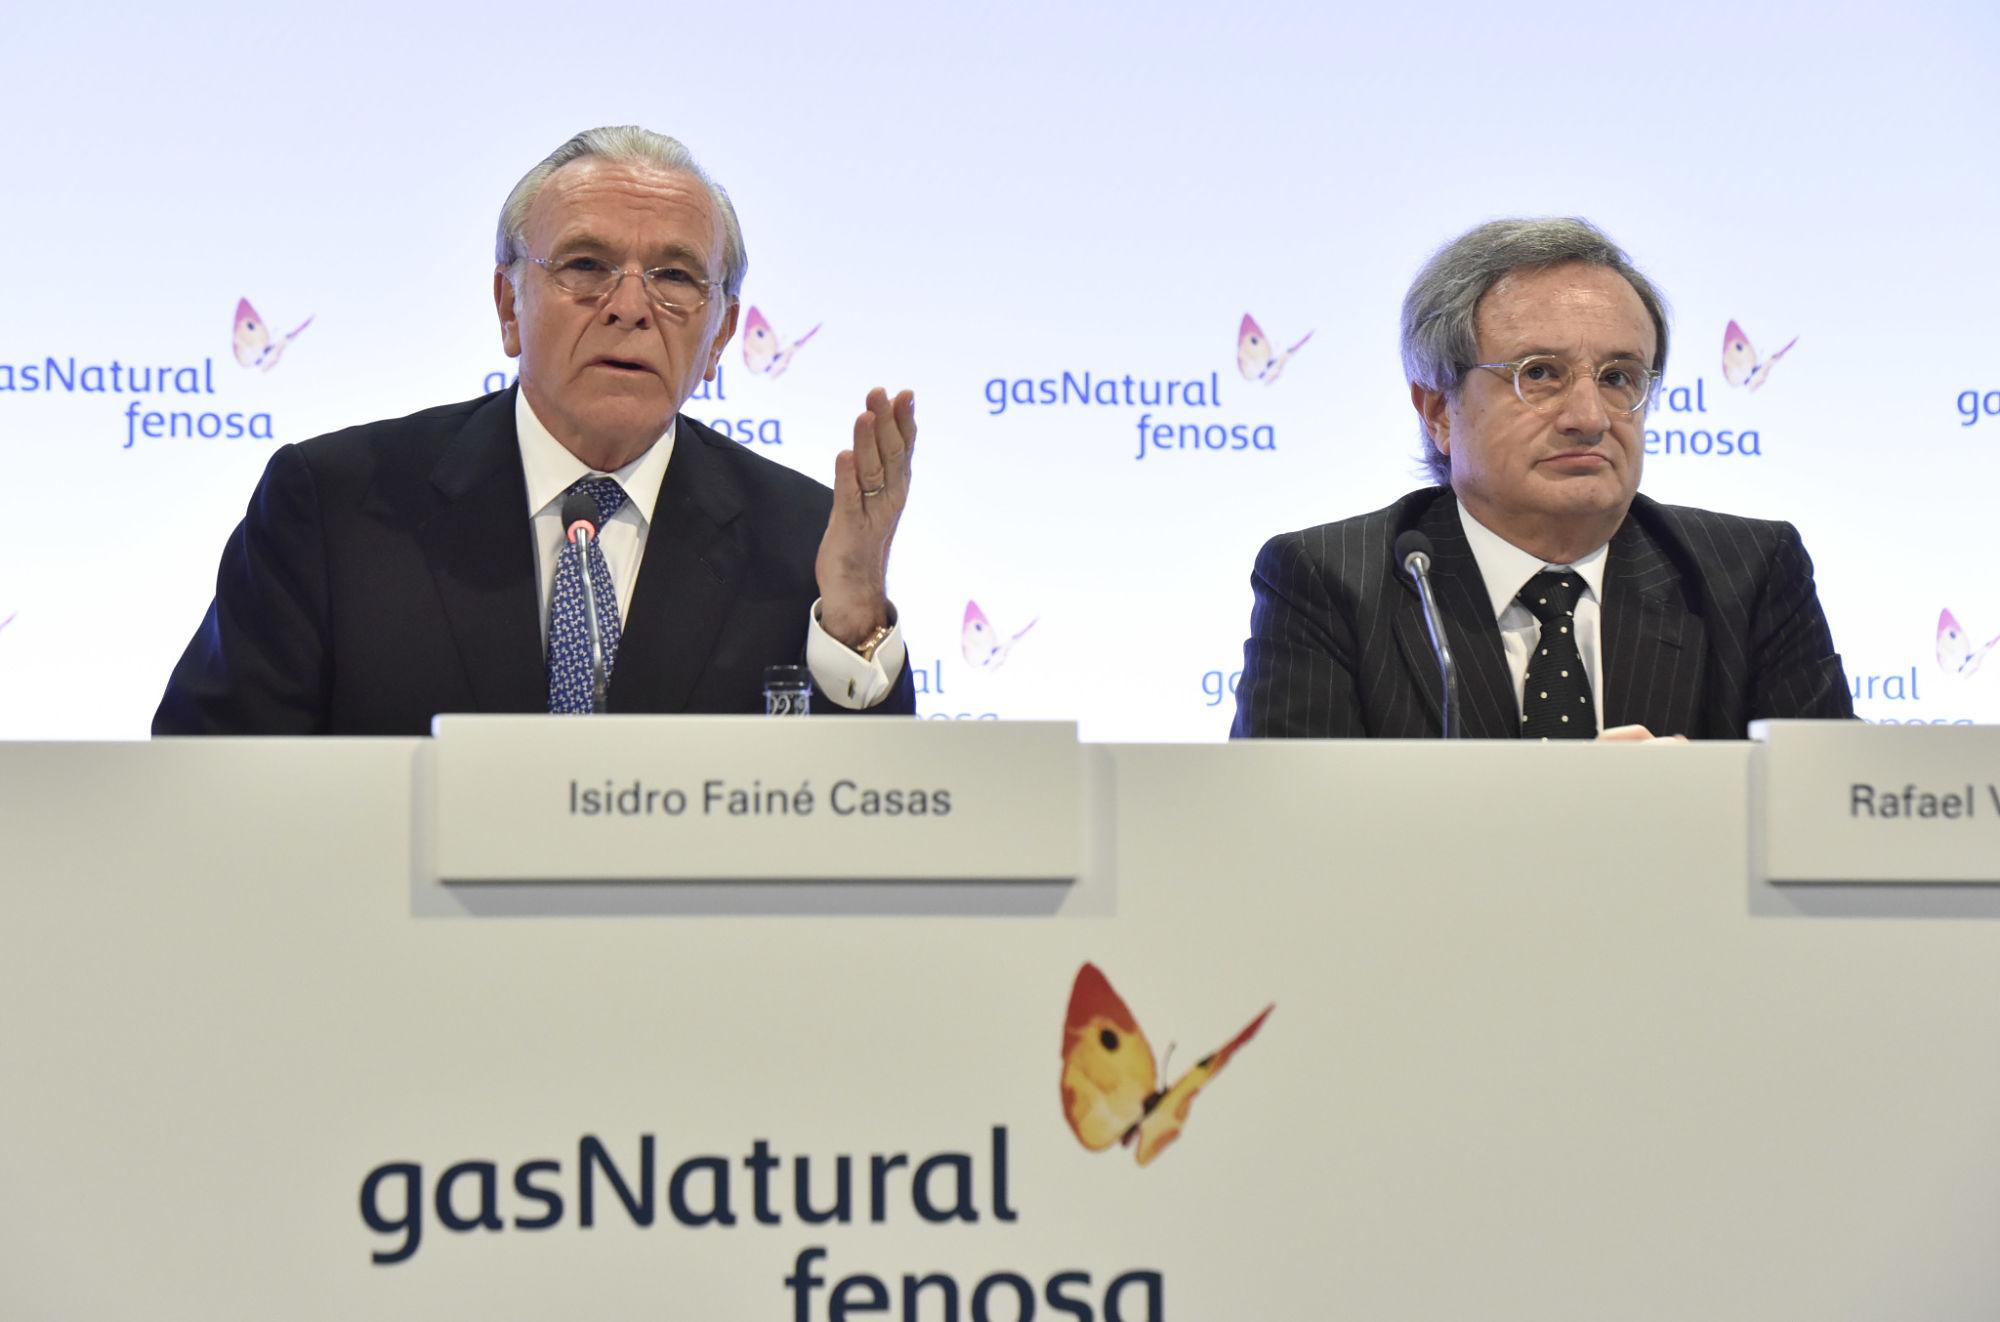 Foto: Gas Natural Fenosa